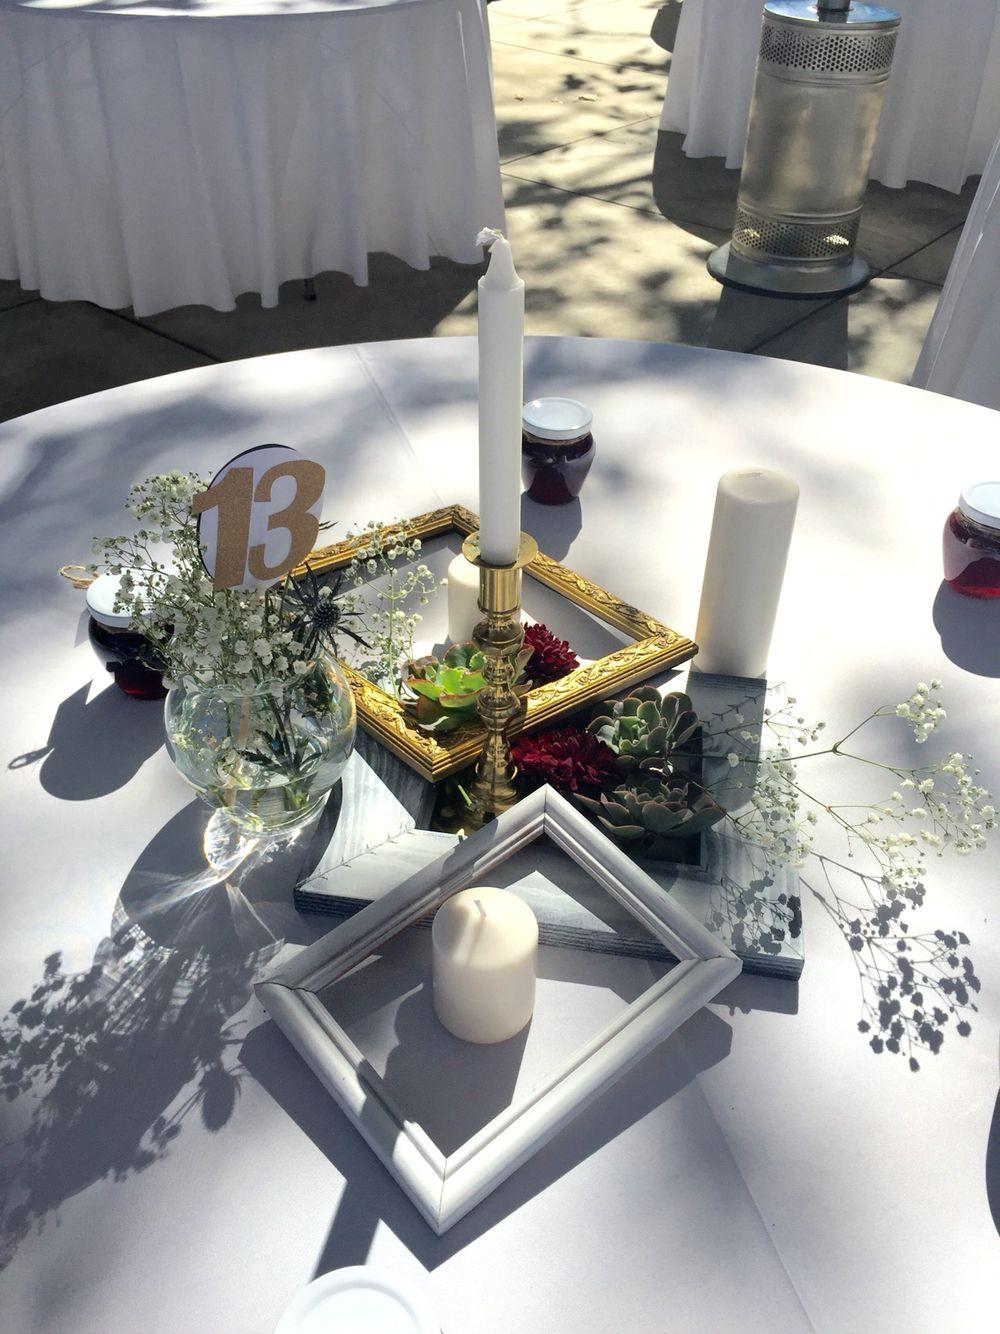 Diy painted frames succulents wedding center pieces ashley